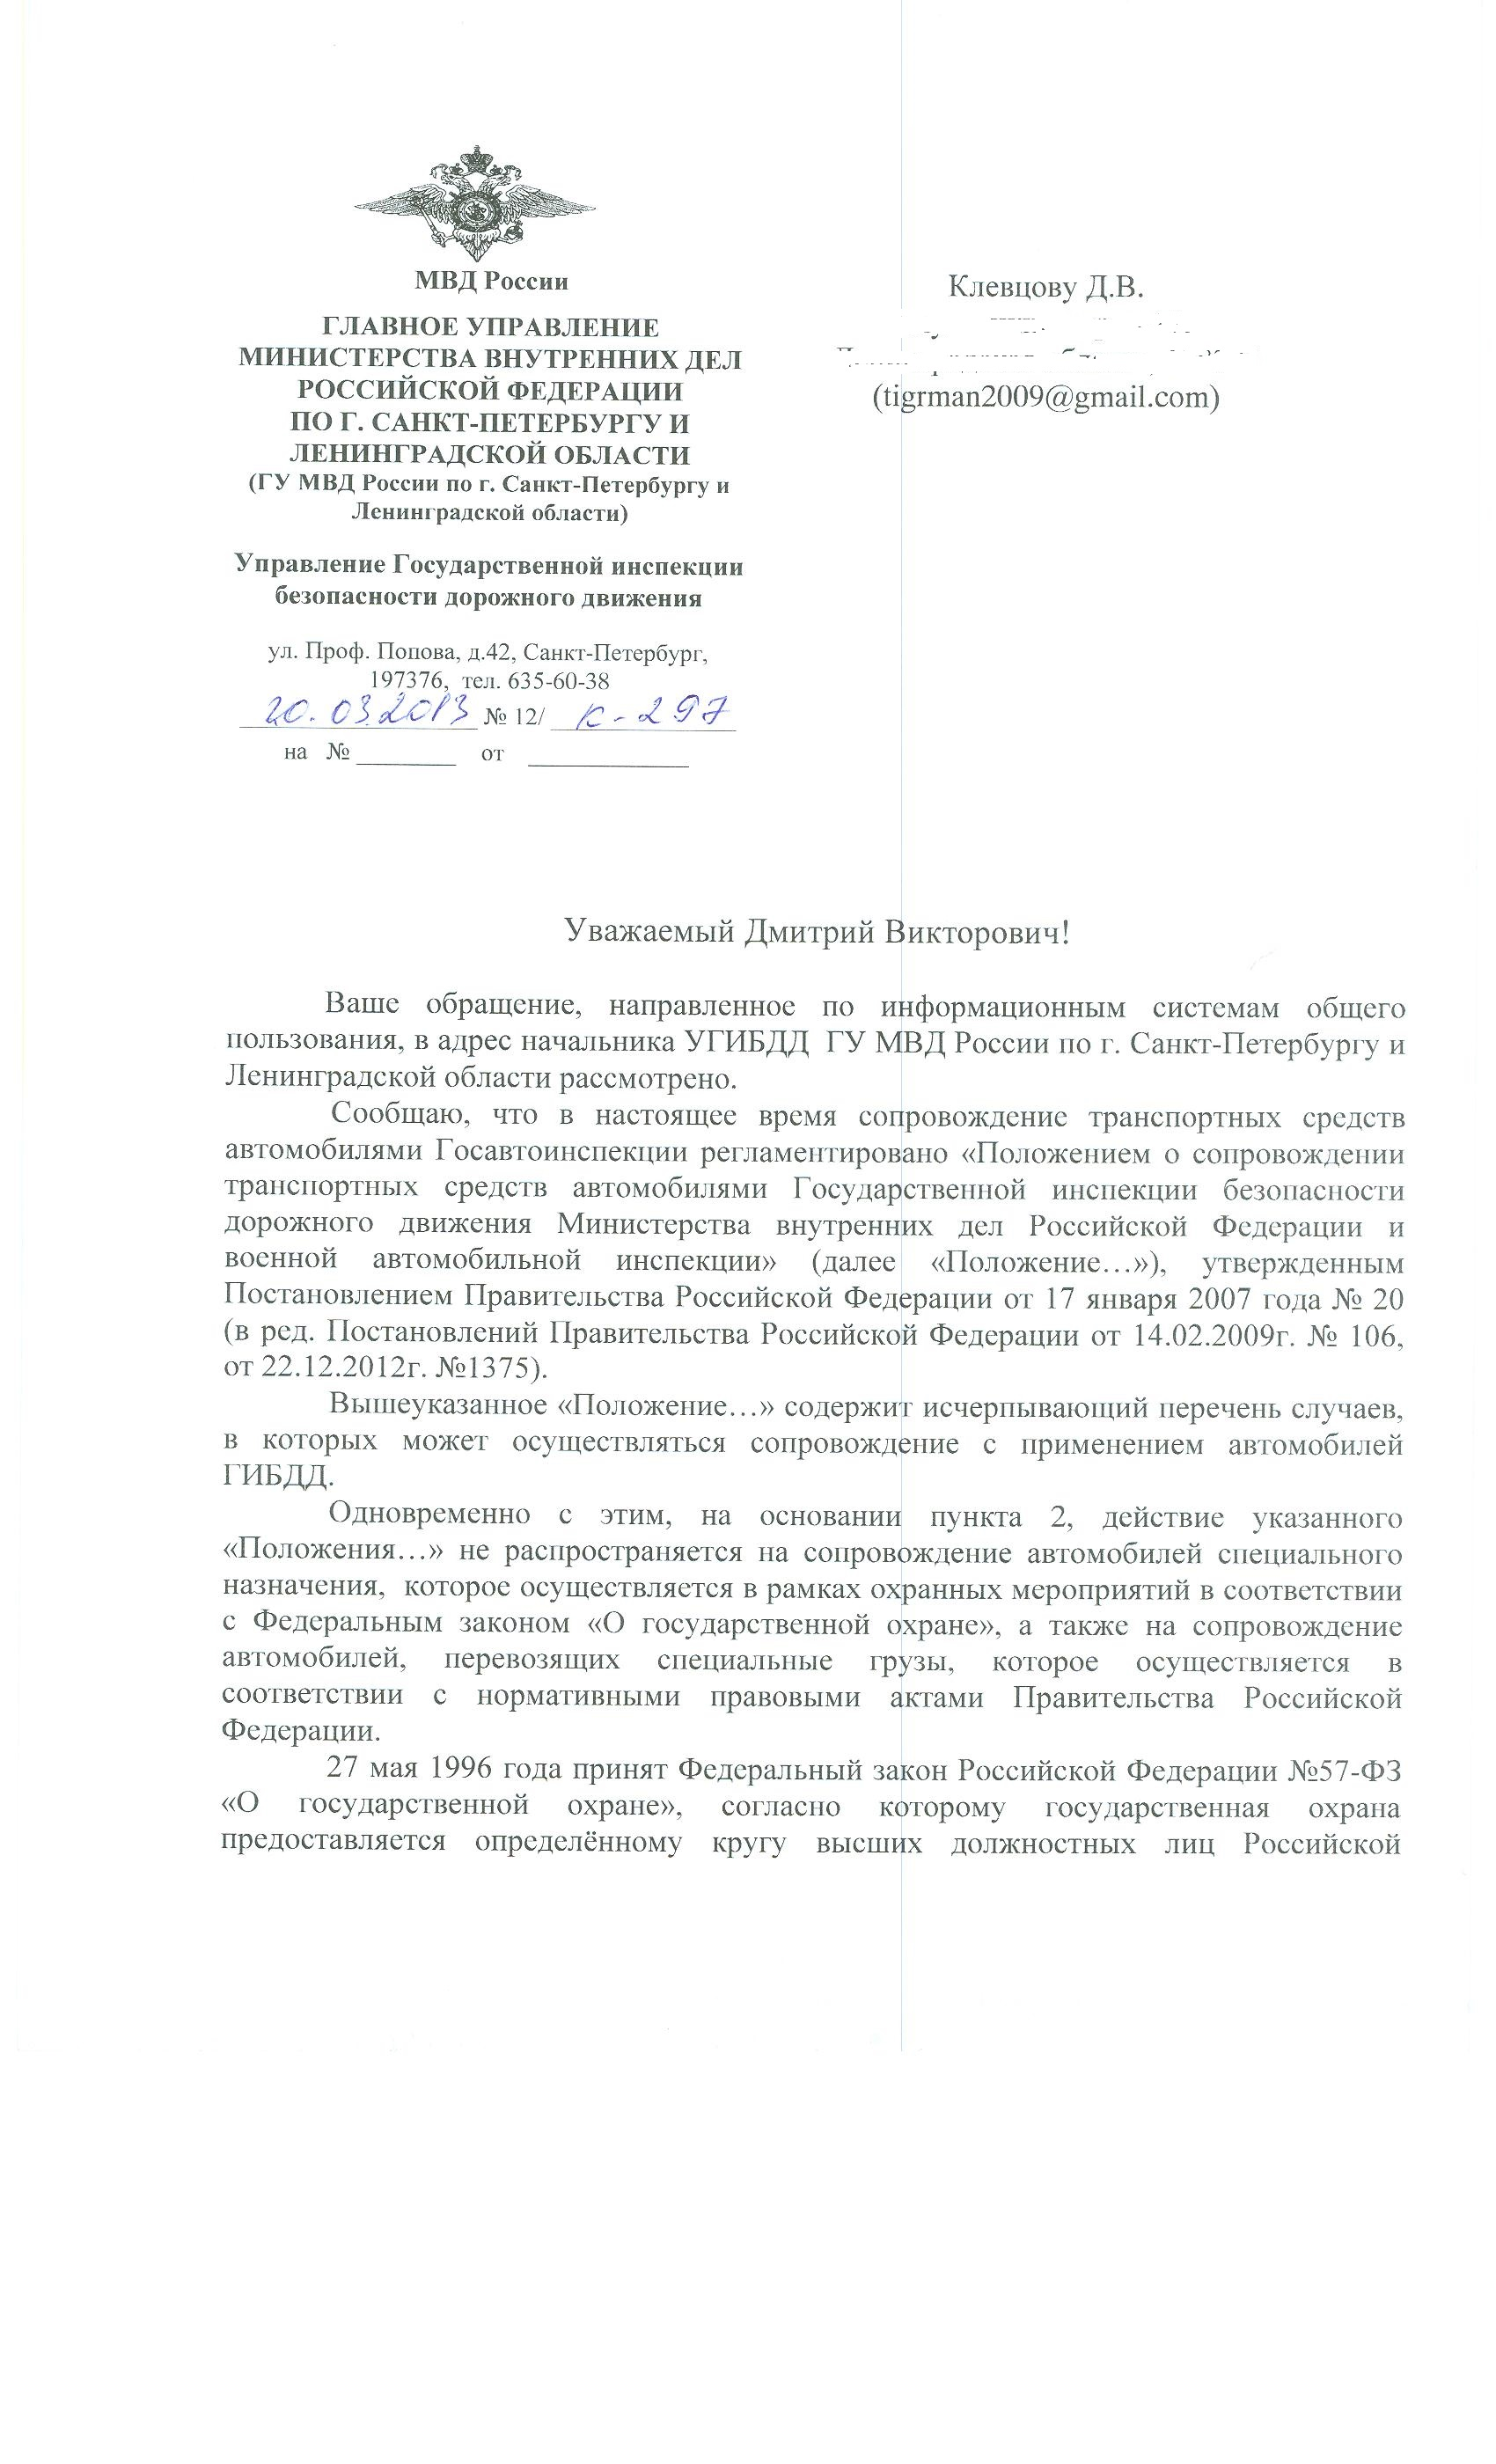 КЛЕВЦОВ1